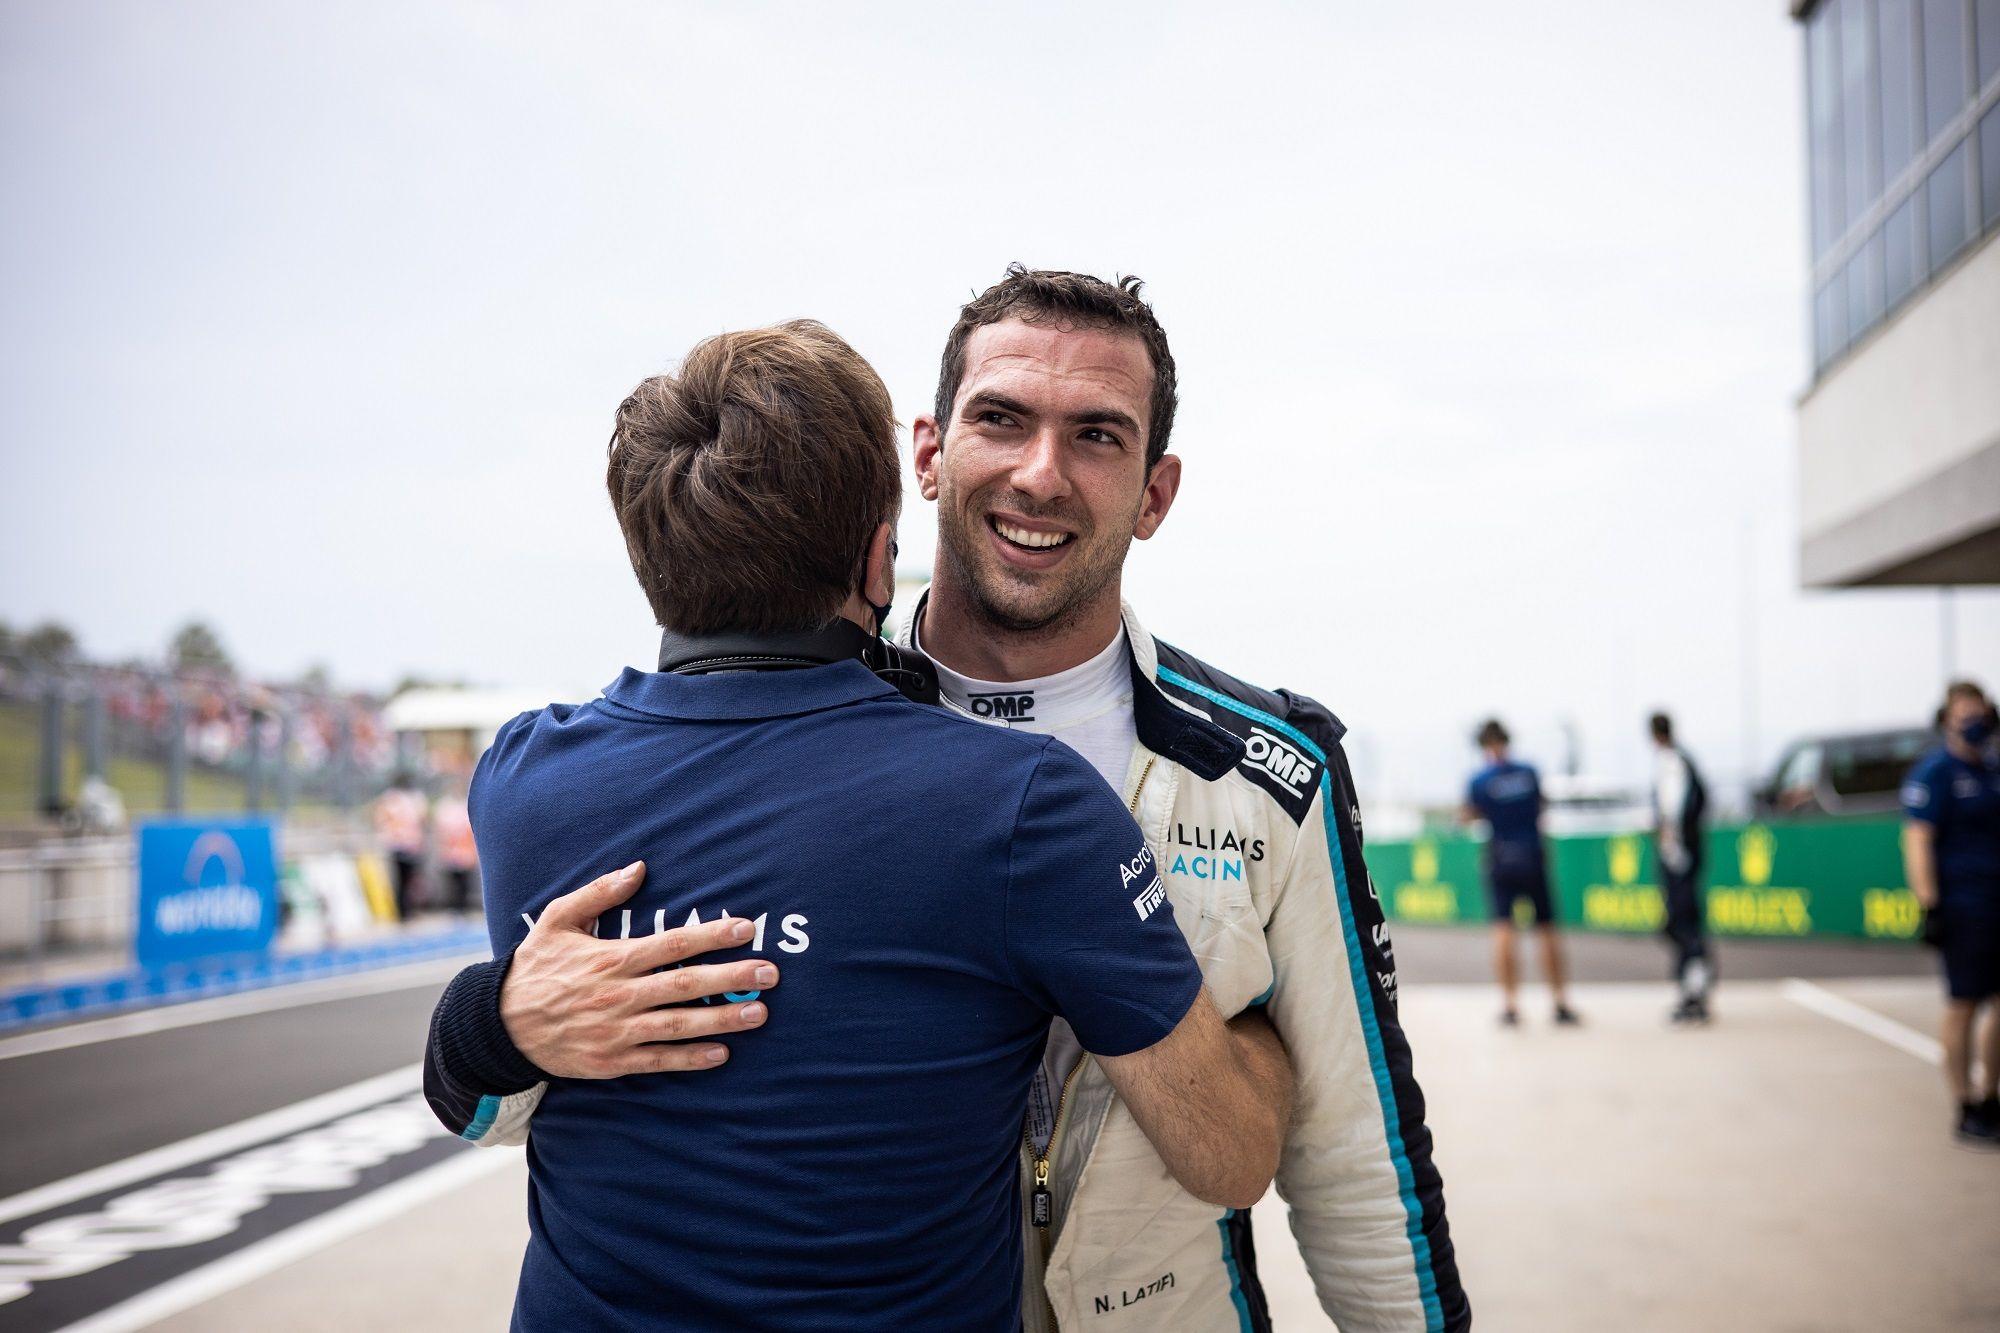 Jost Capito, Williams, Nicholas Latifi, F1